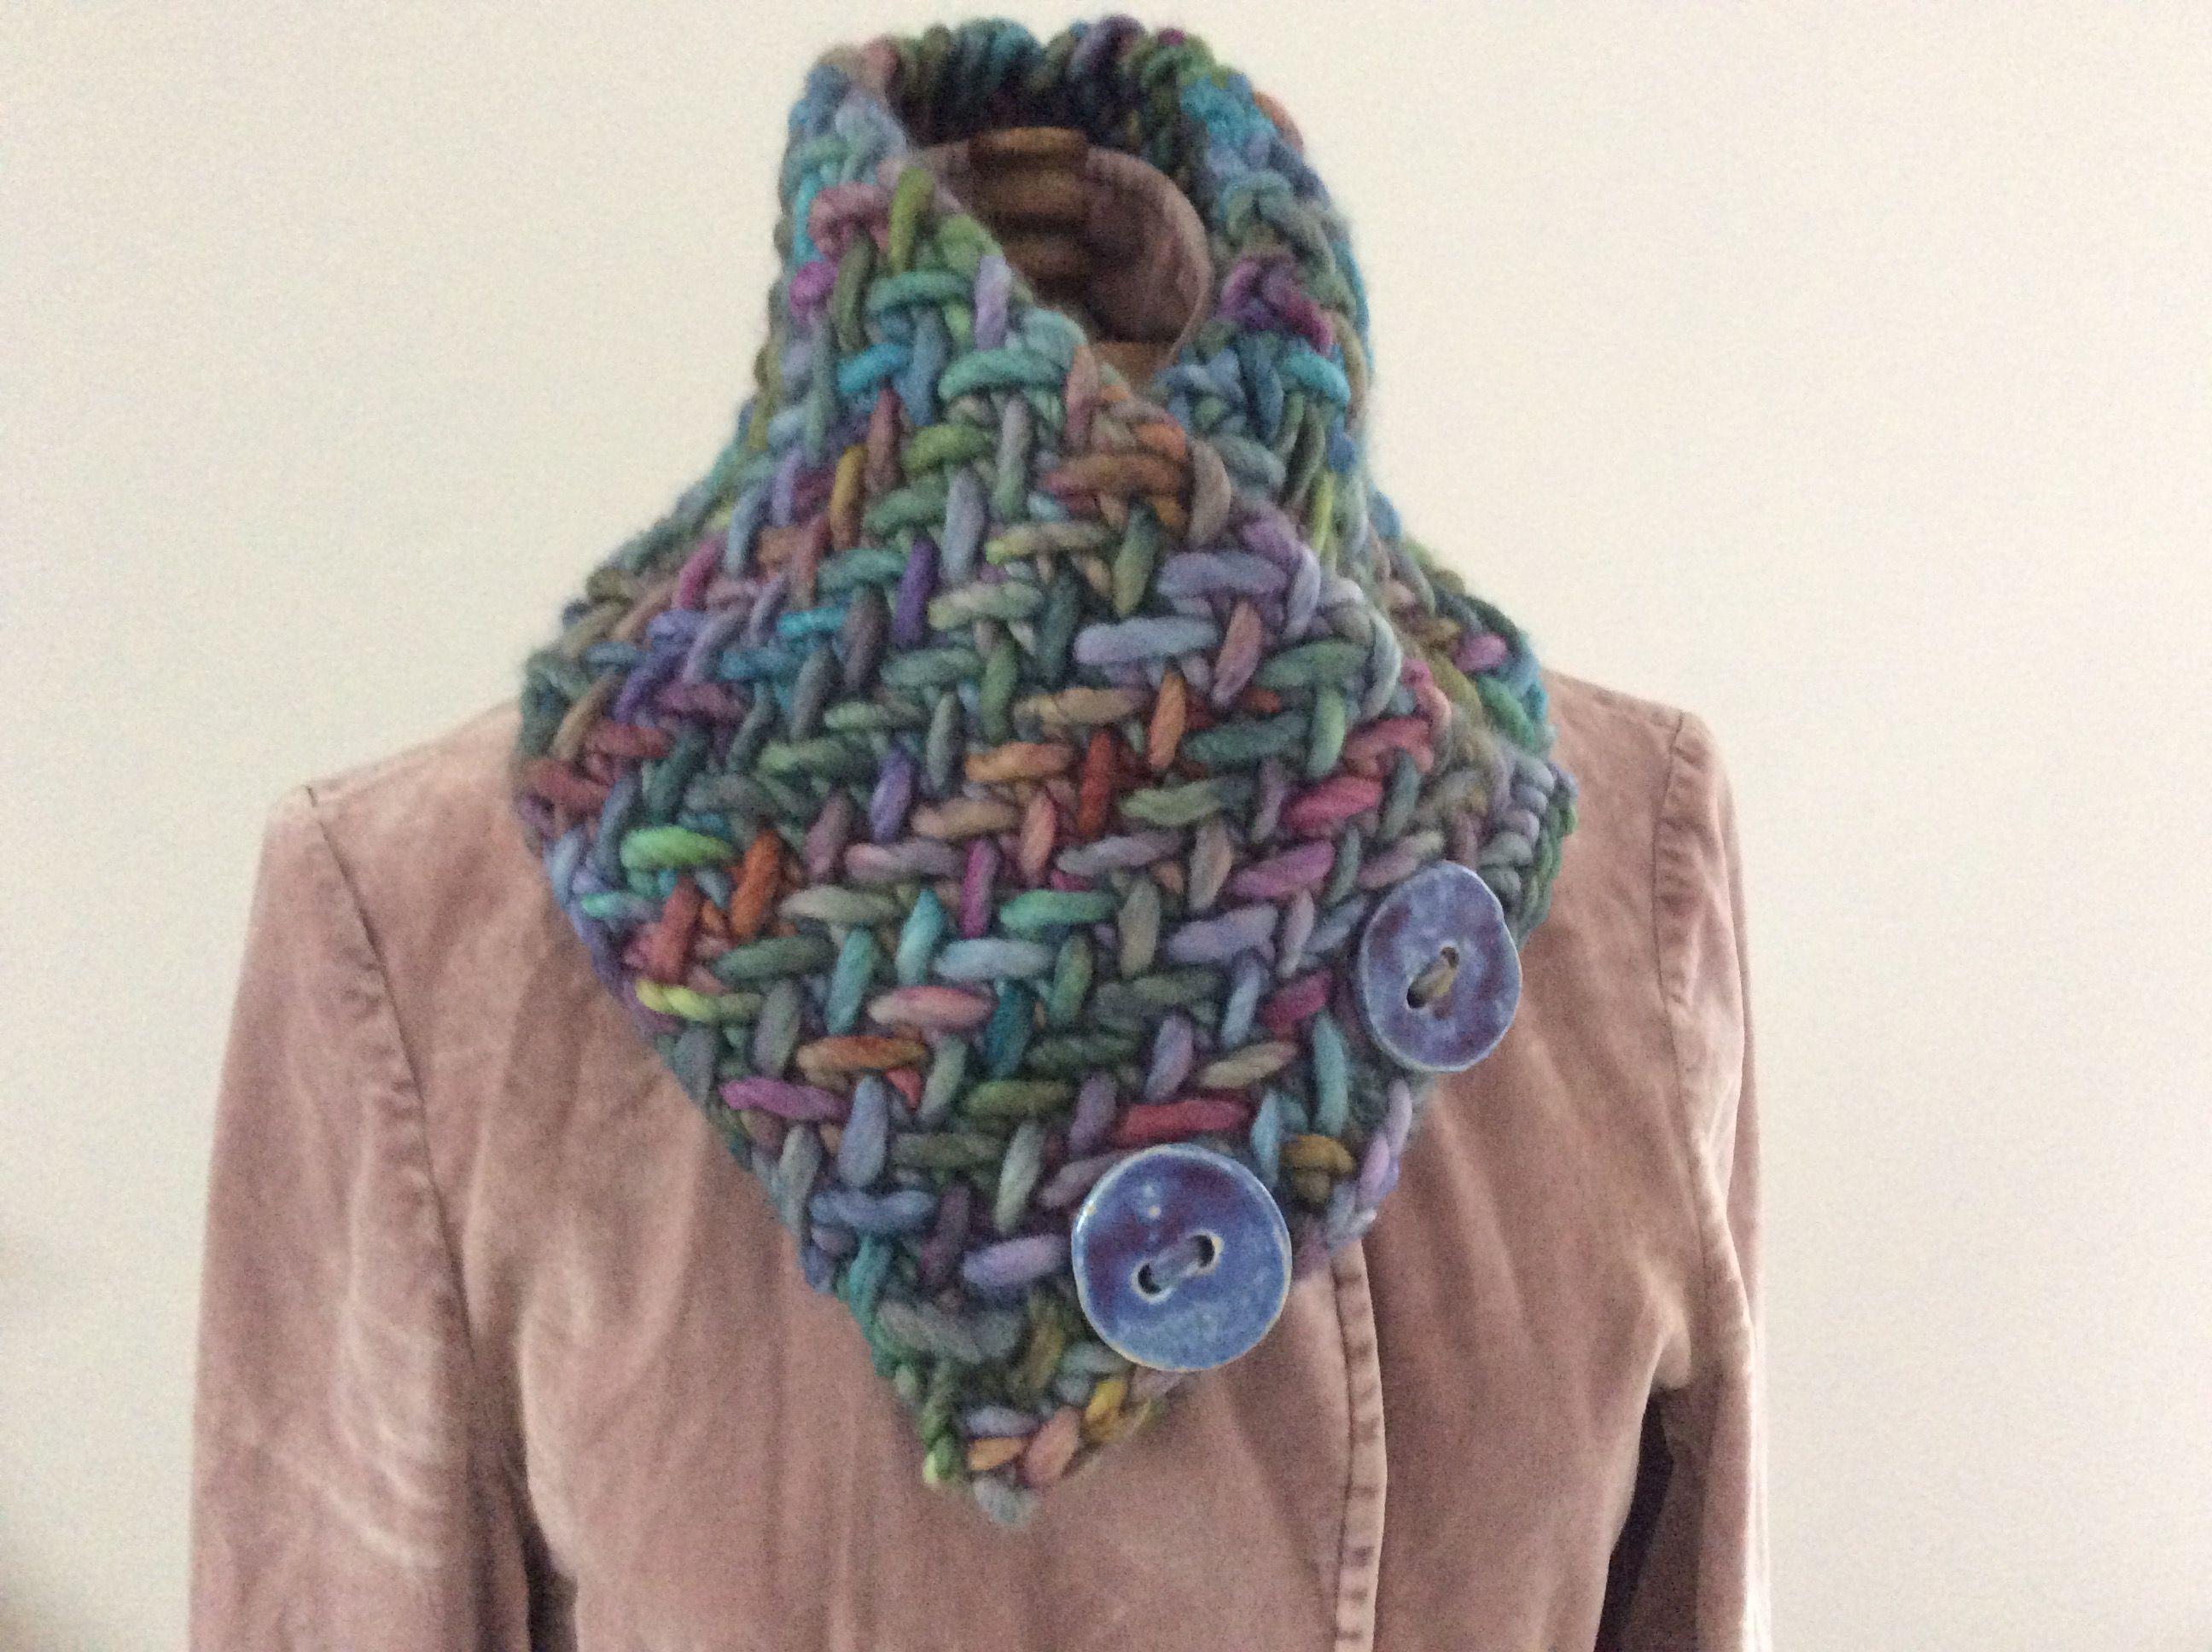 Herringbone Stitch Neckwarmer. Pattern from Ravelry by Breean Elyse Miller. Knitted using Malabrigo Rasta and 15mm needles. Finished 25th February.